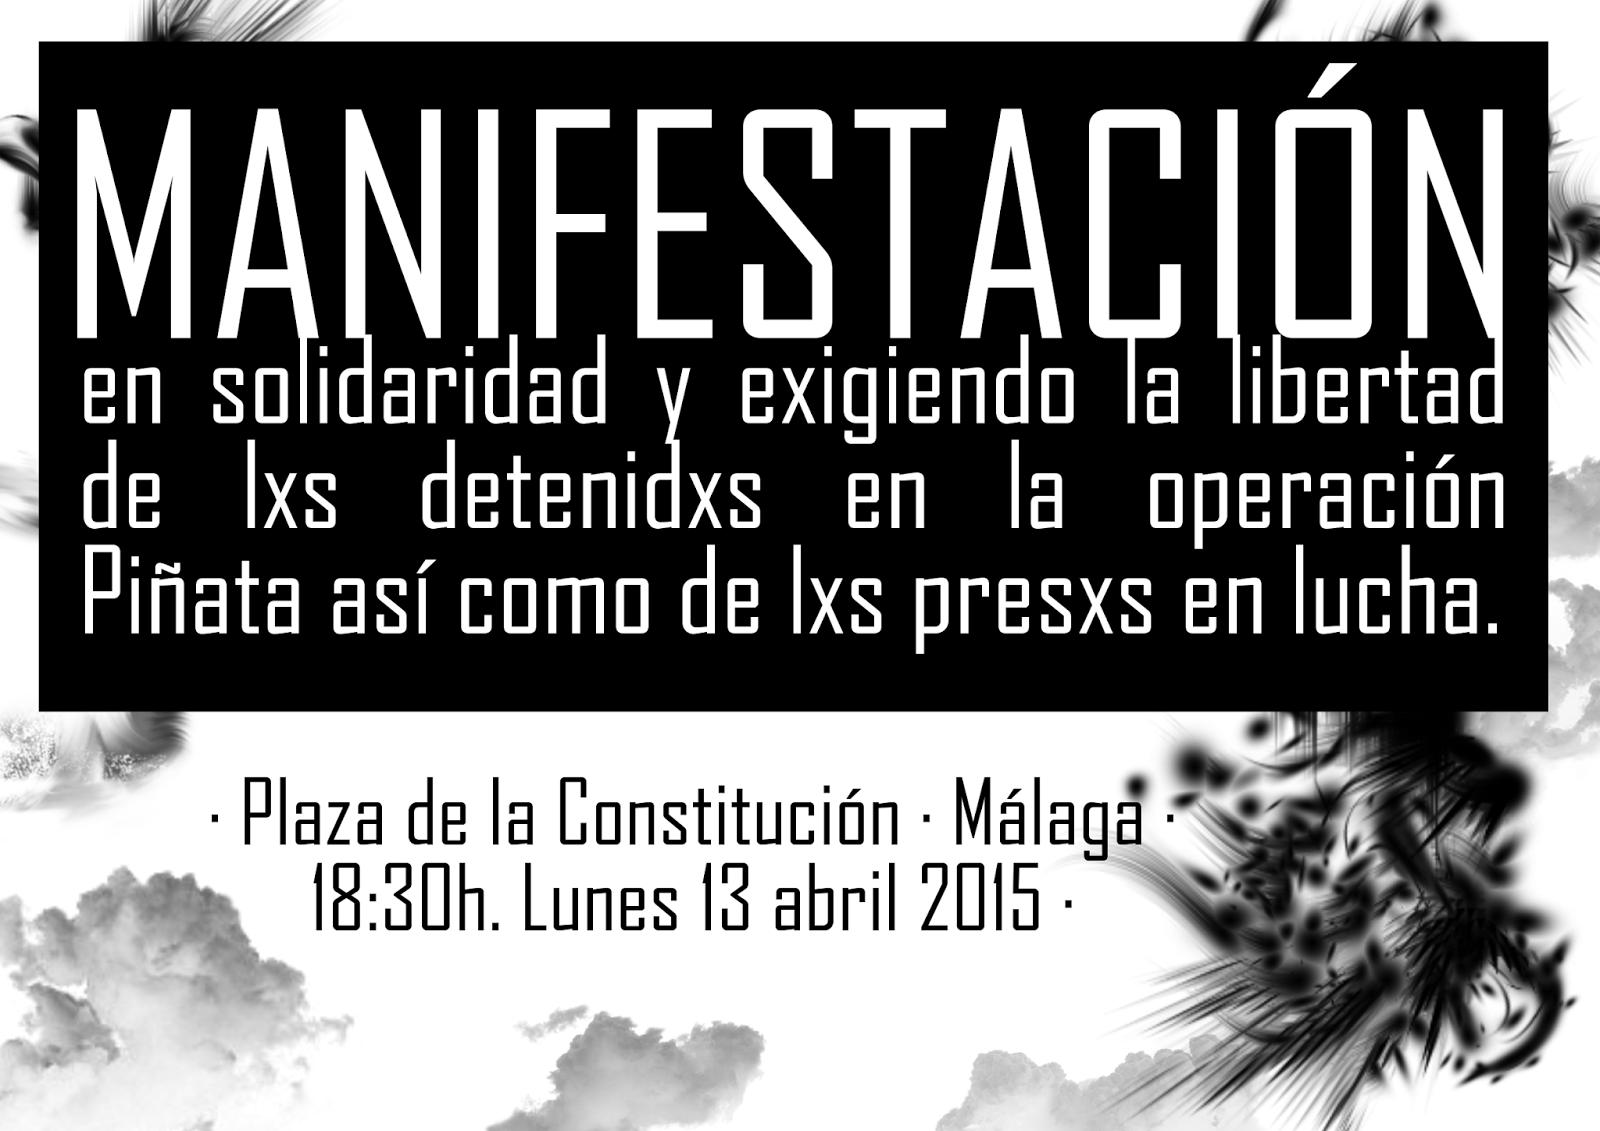 https://twitter.com/hashtag/YoTambi%C3%A9nSoyAnarquista?src=hash